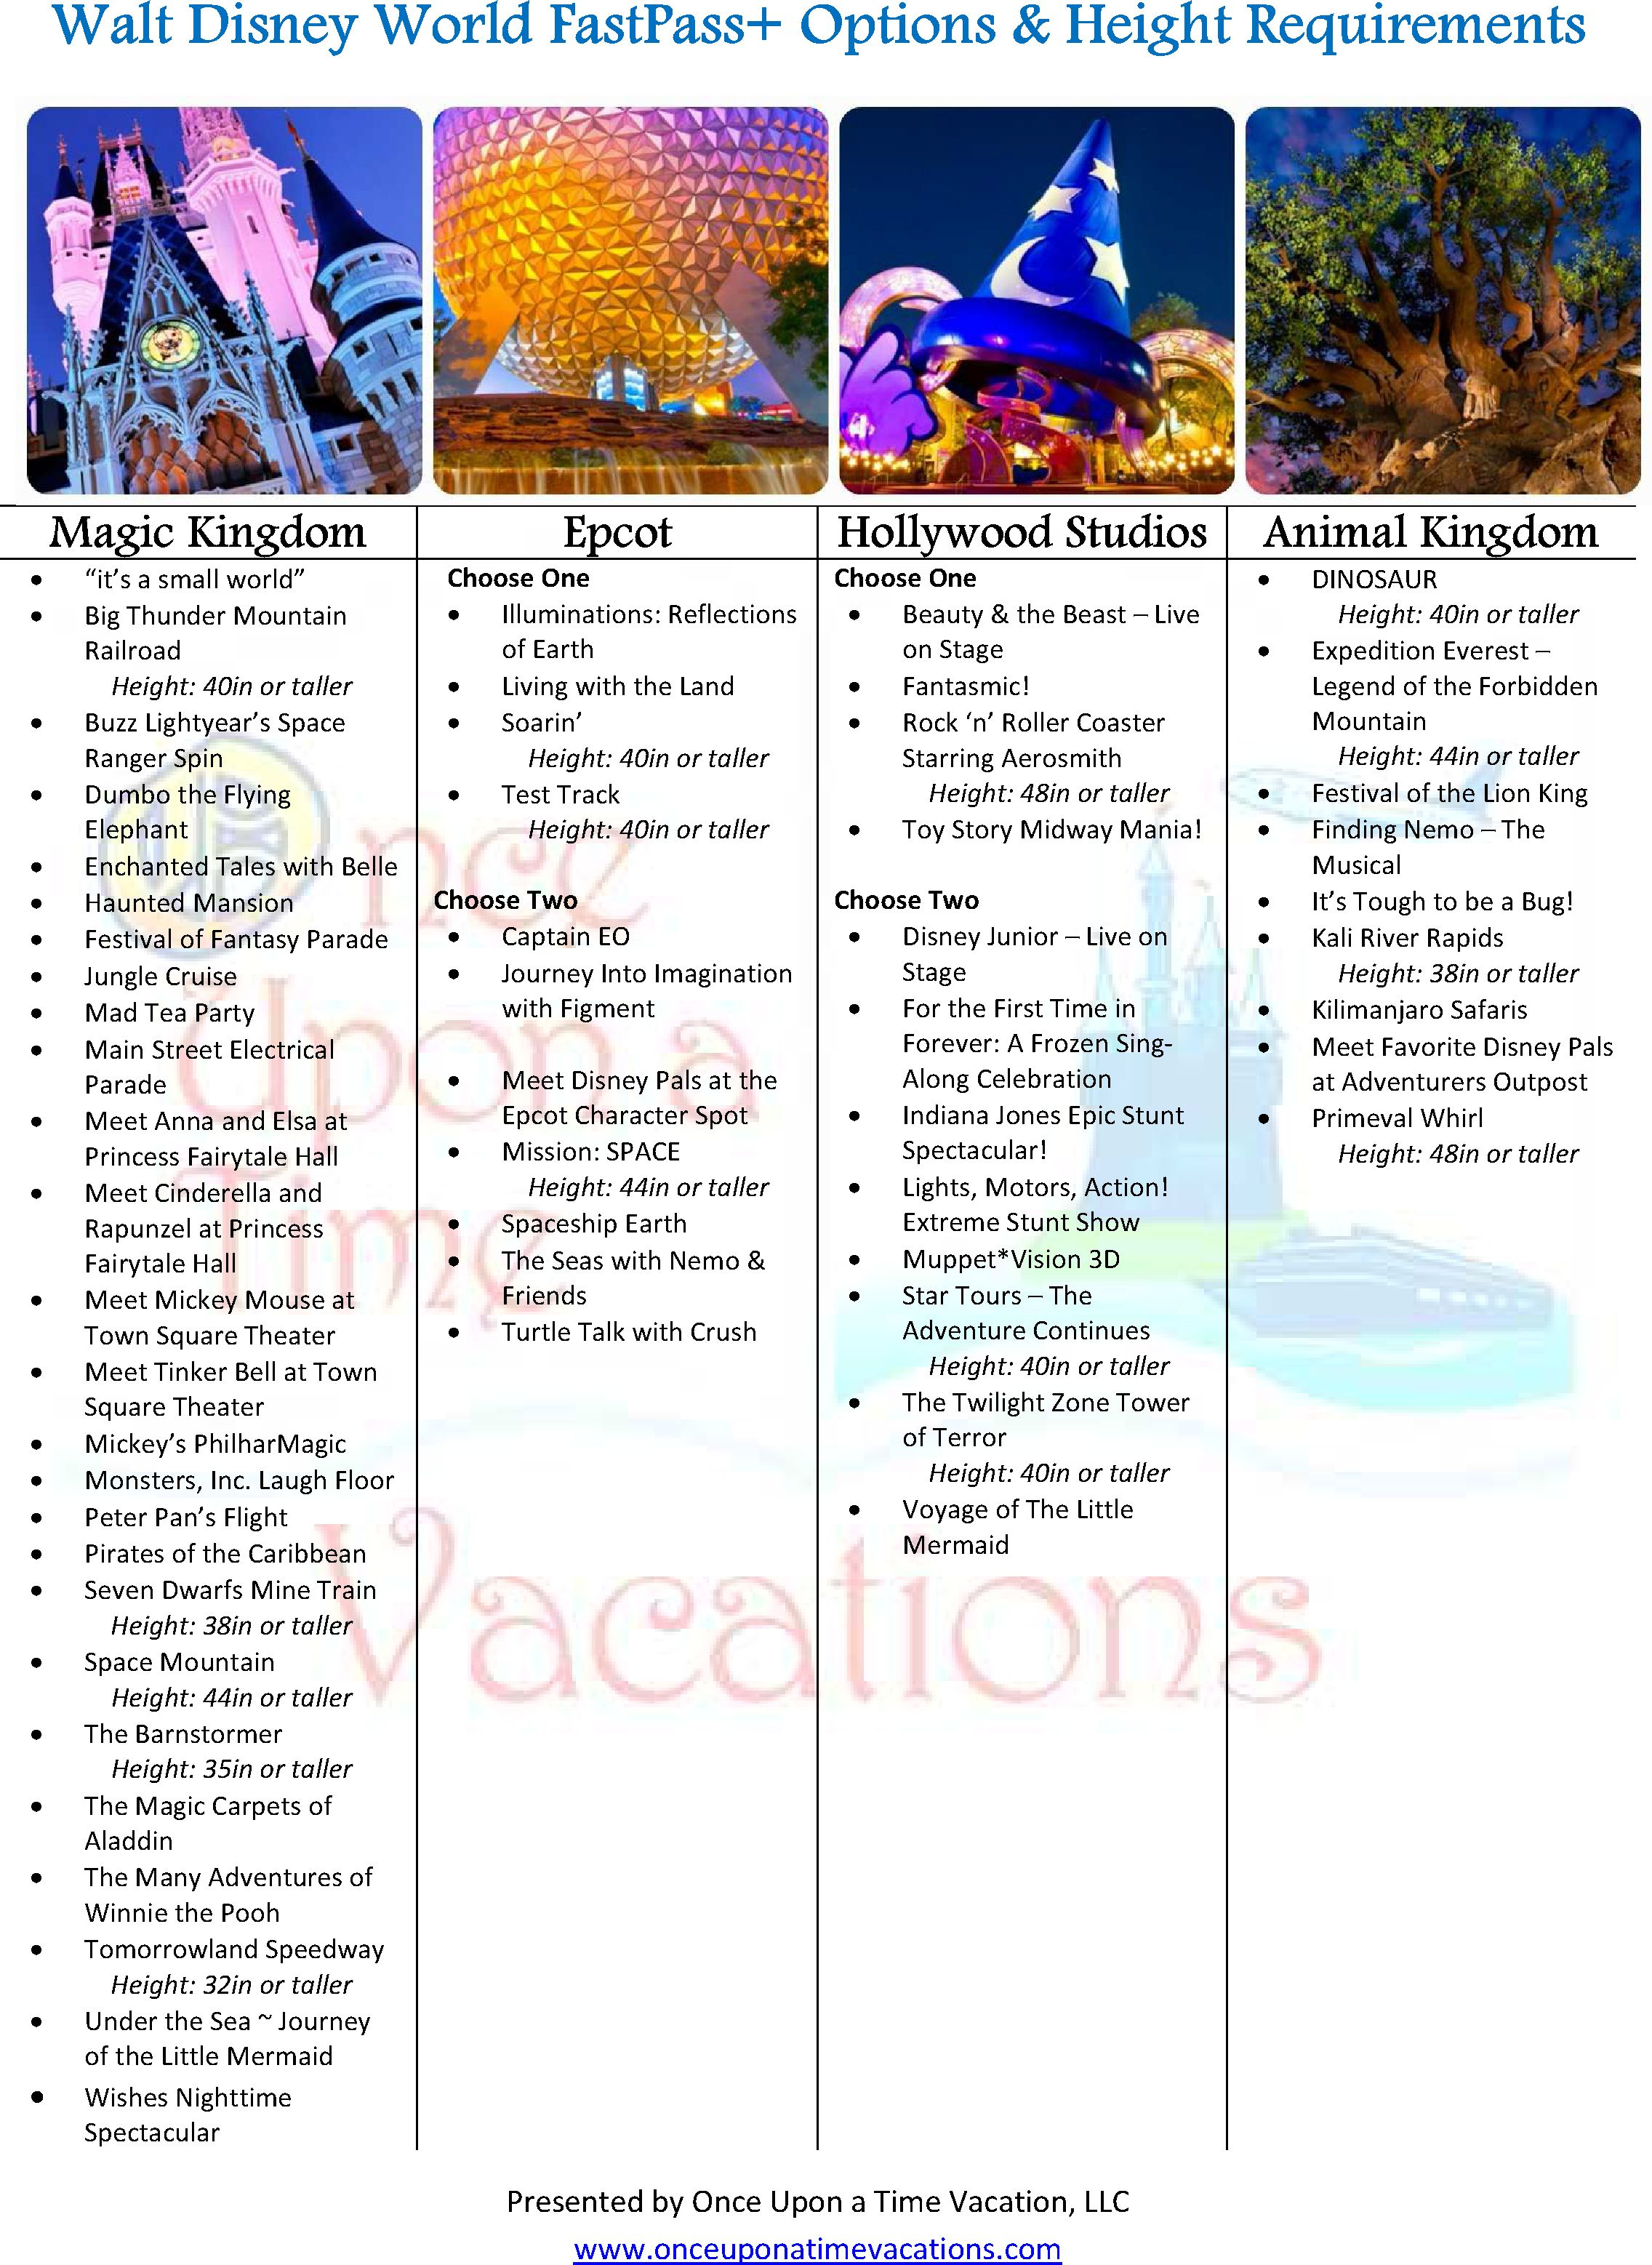 Walt Disney World Honeymoon Packages